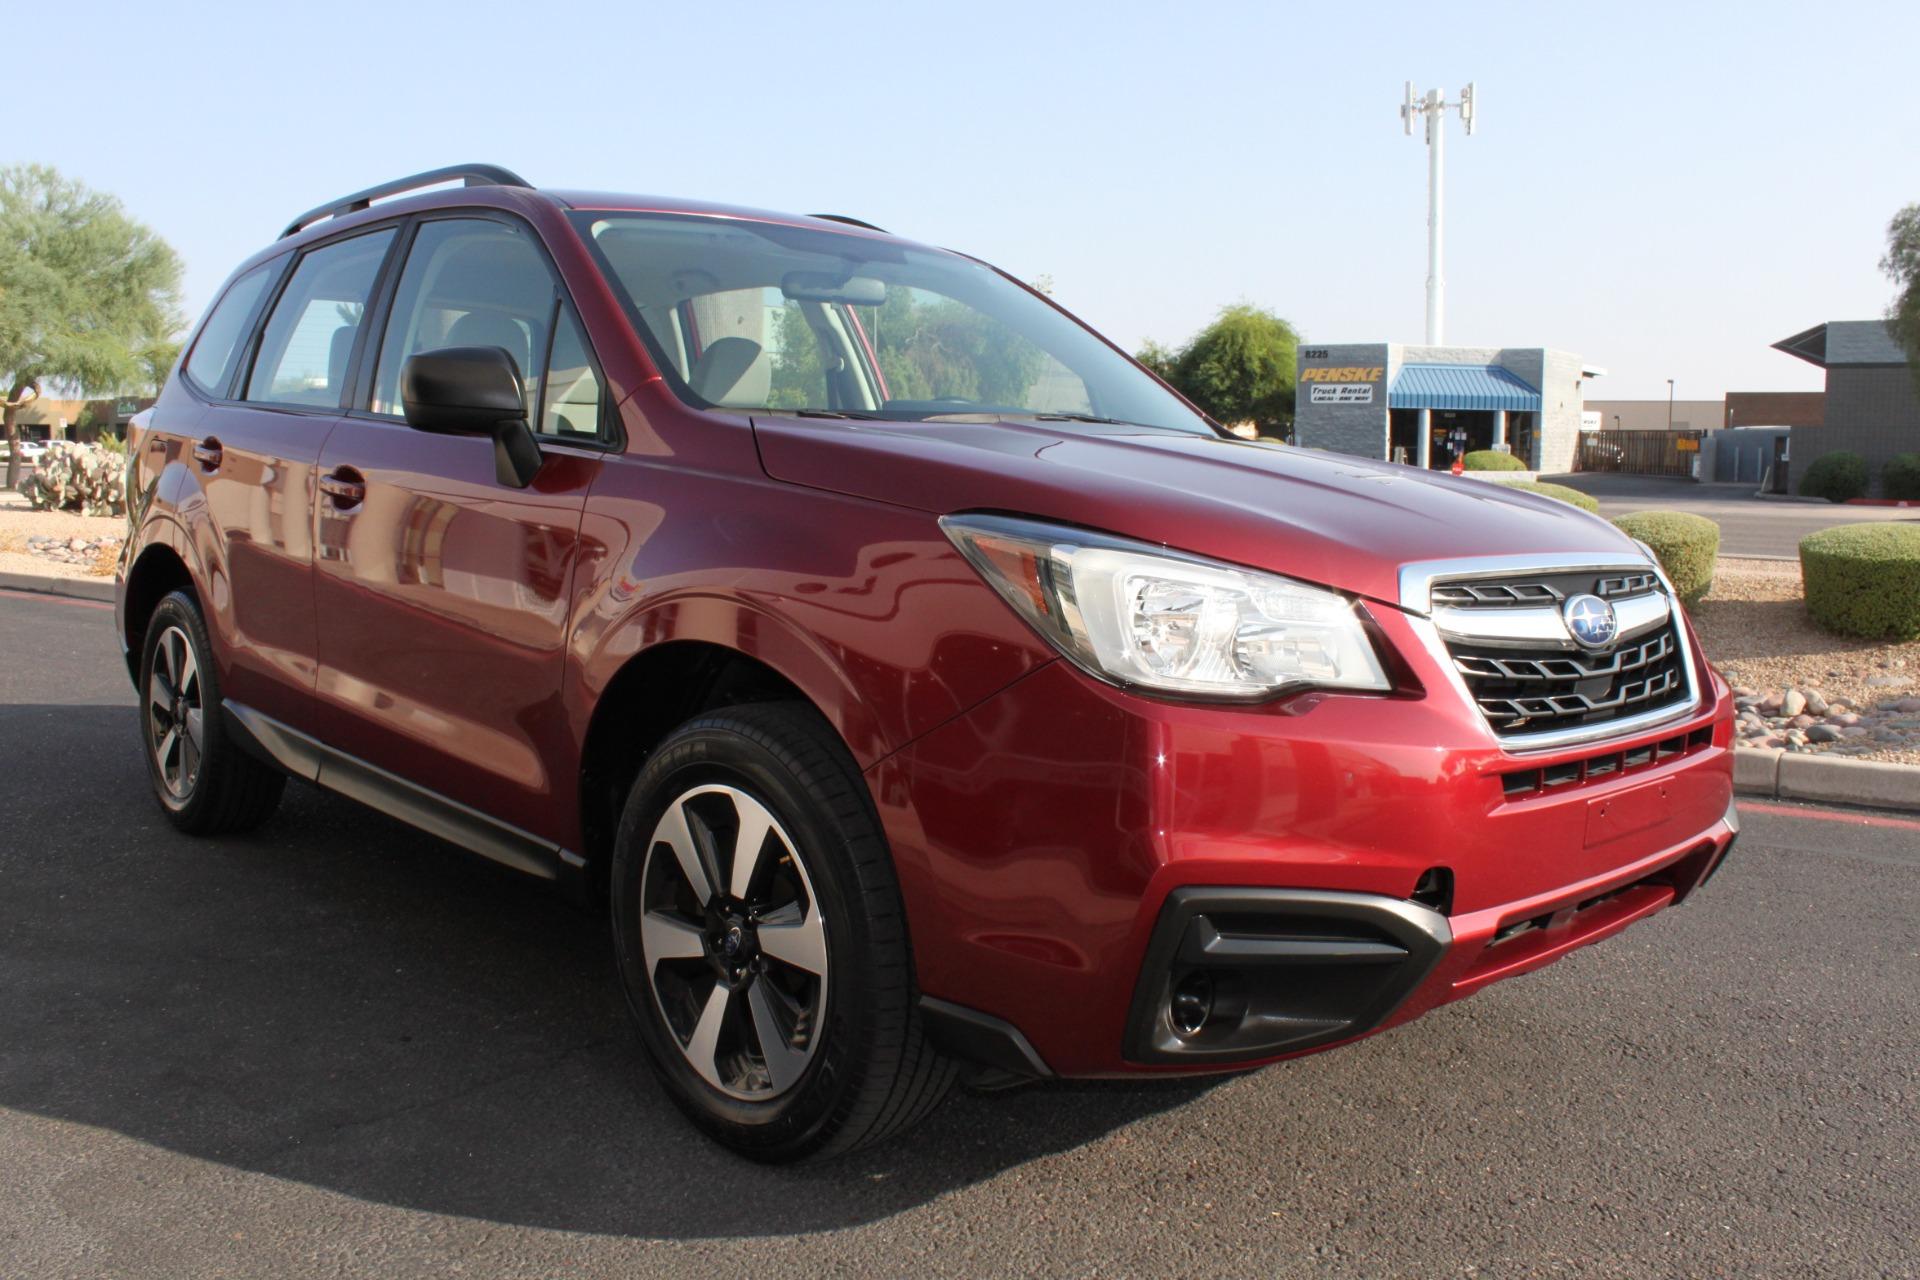 Used-2017-Subaru-Forester-25i-All-Wheel-Drive-25i-Mercedes-Benz